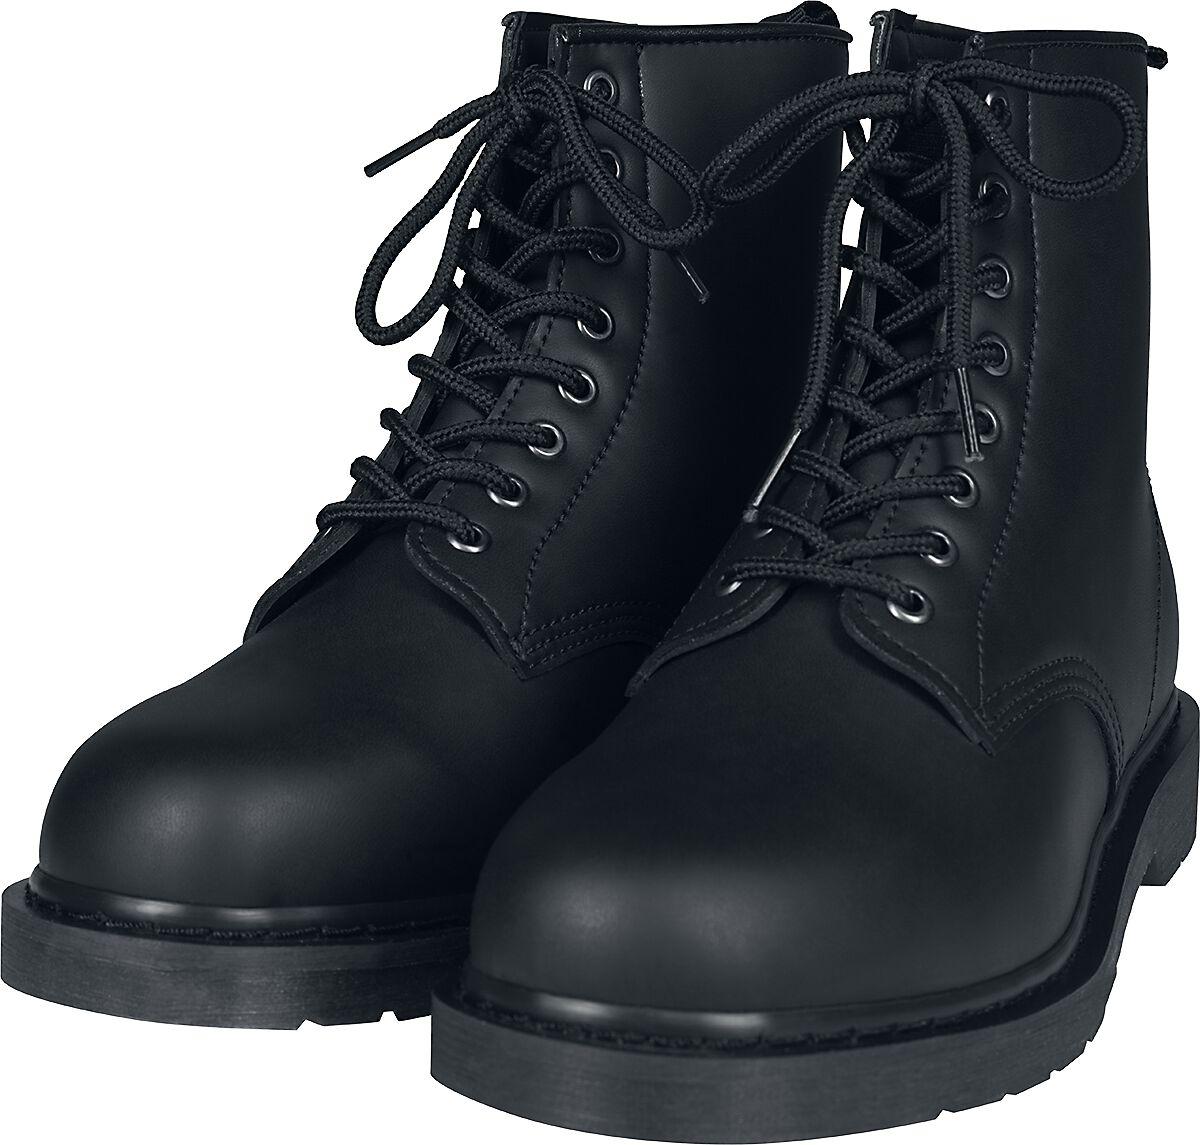 Image of   Urban Classics Heavy Lace Boot Støvler sort